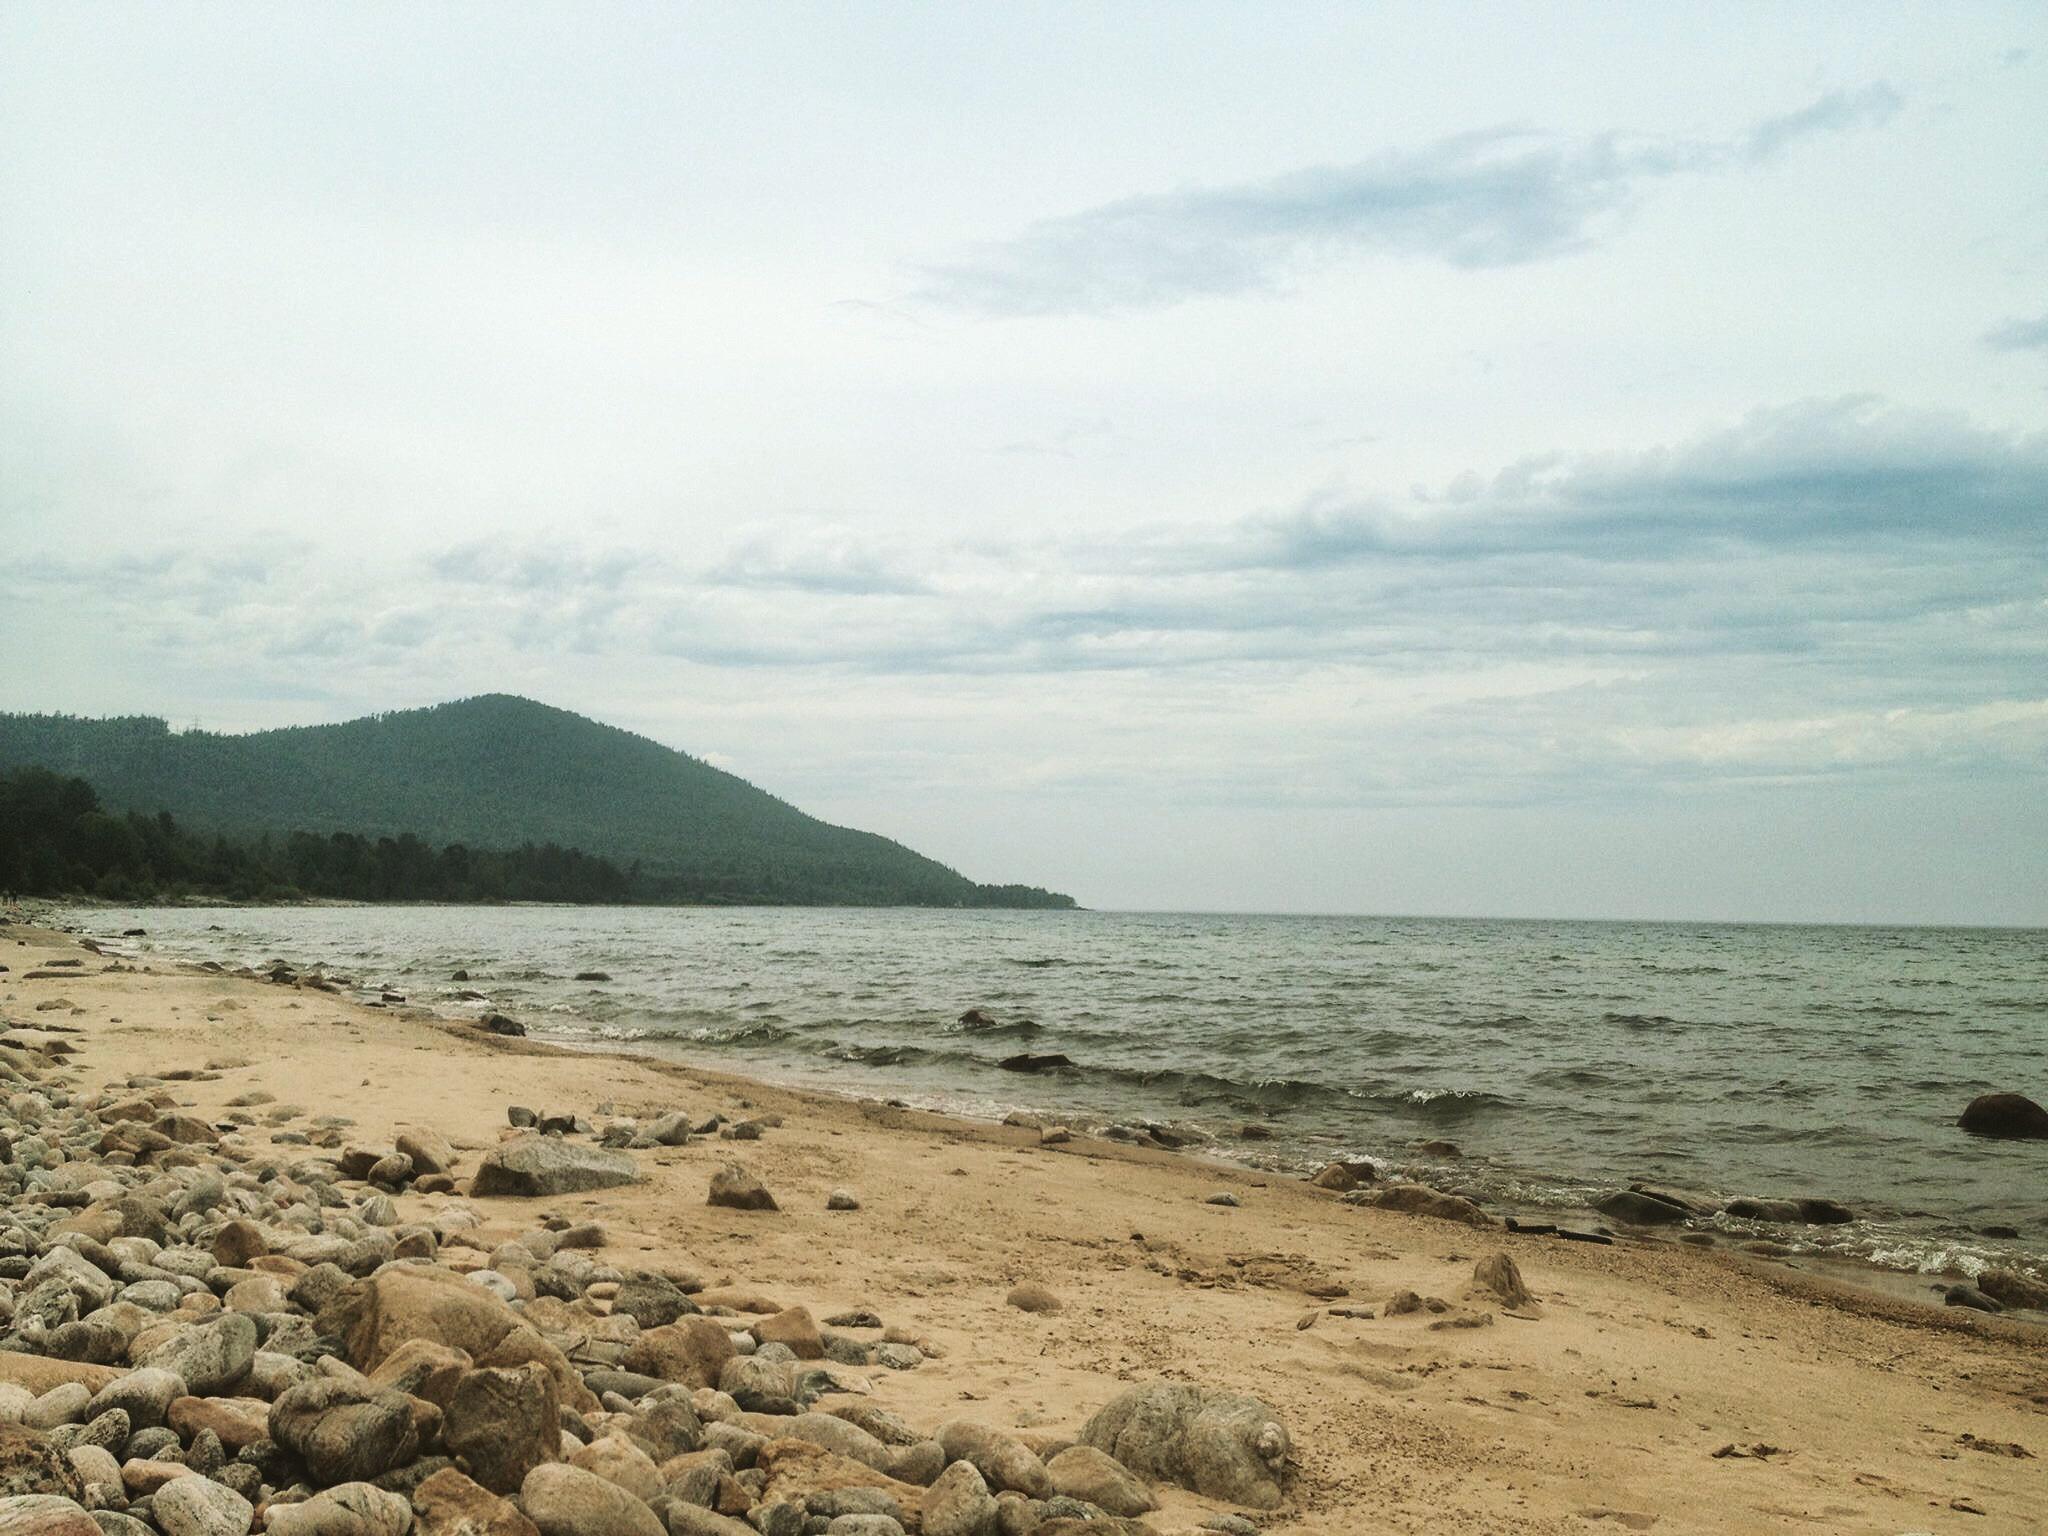 Lake baikal by Berka swan